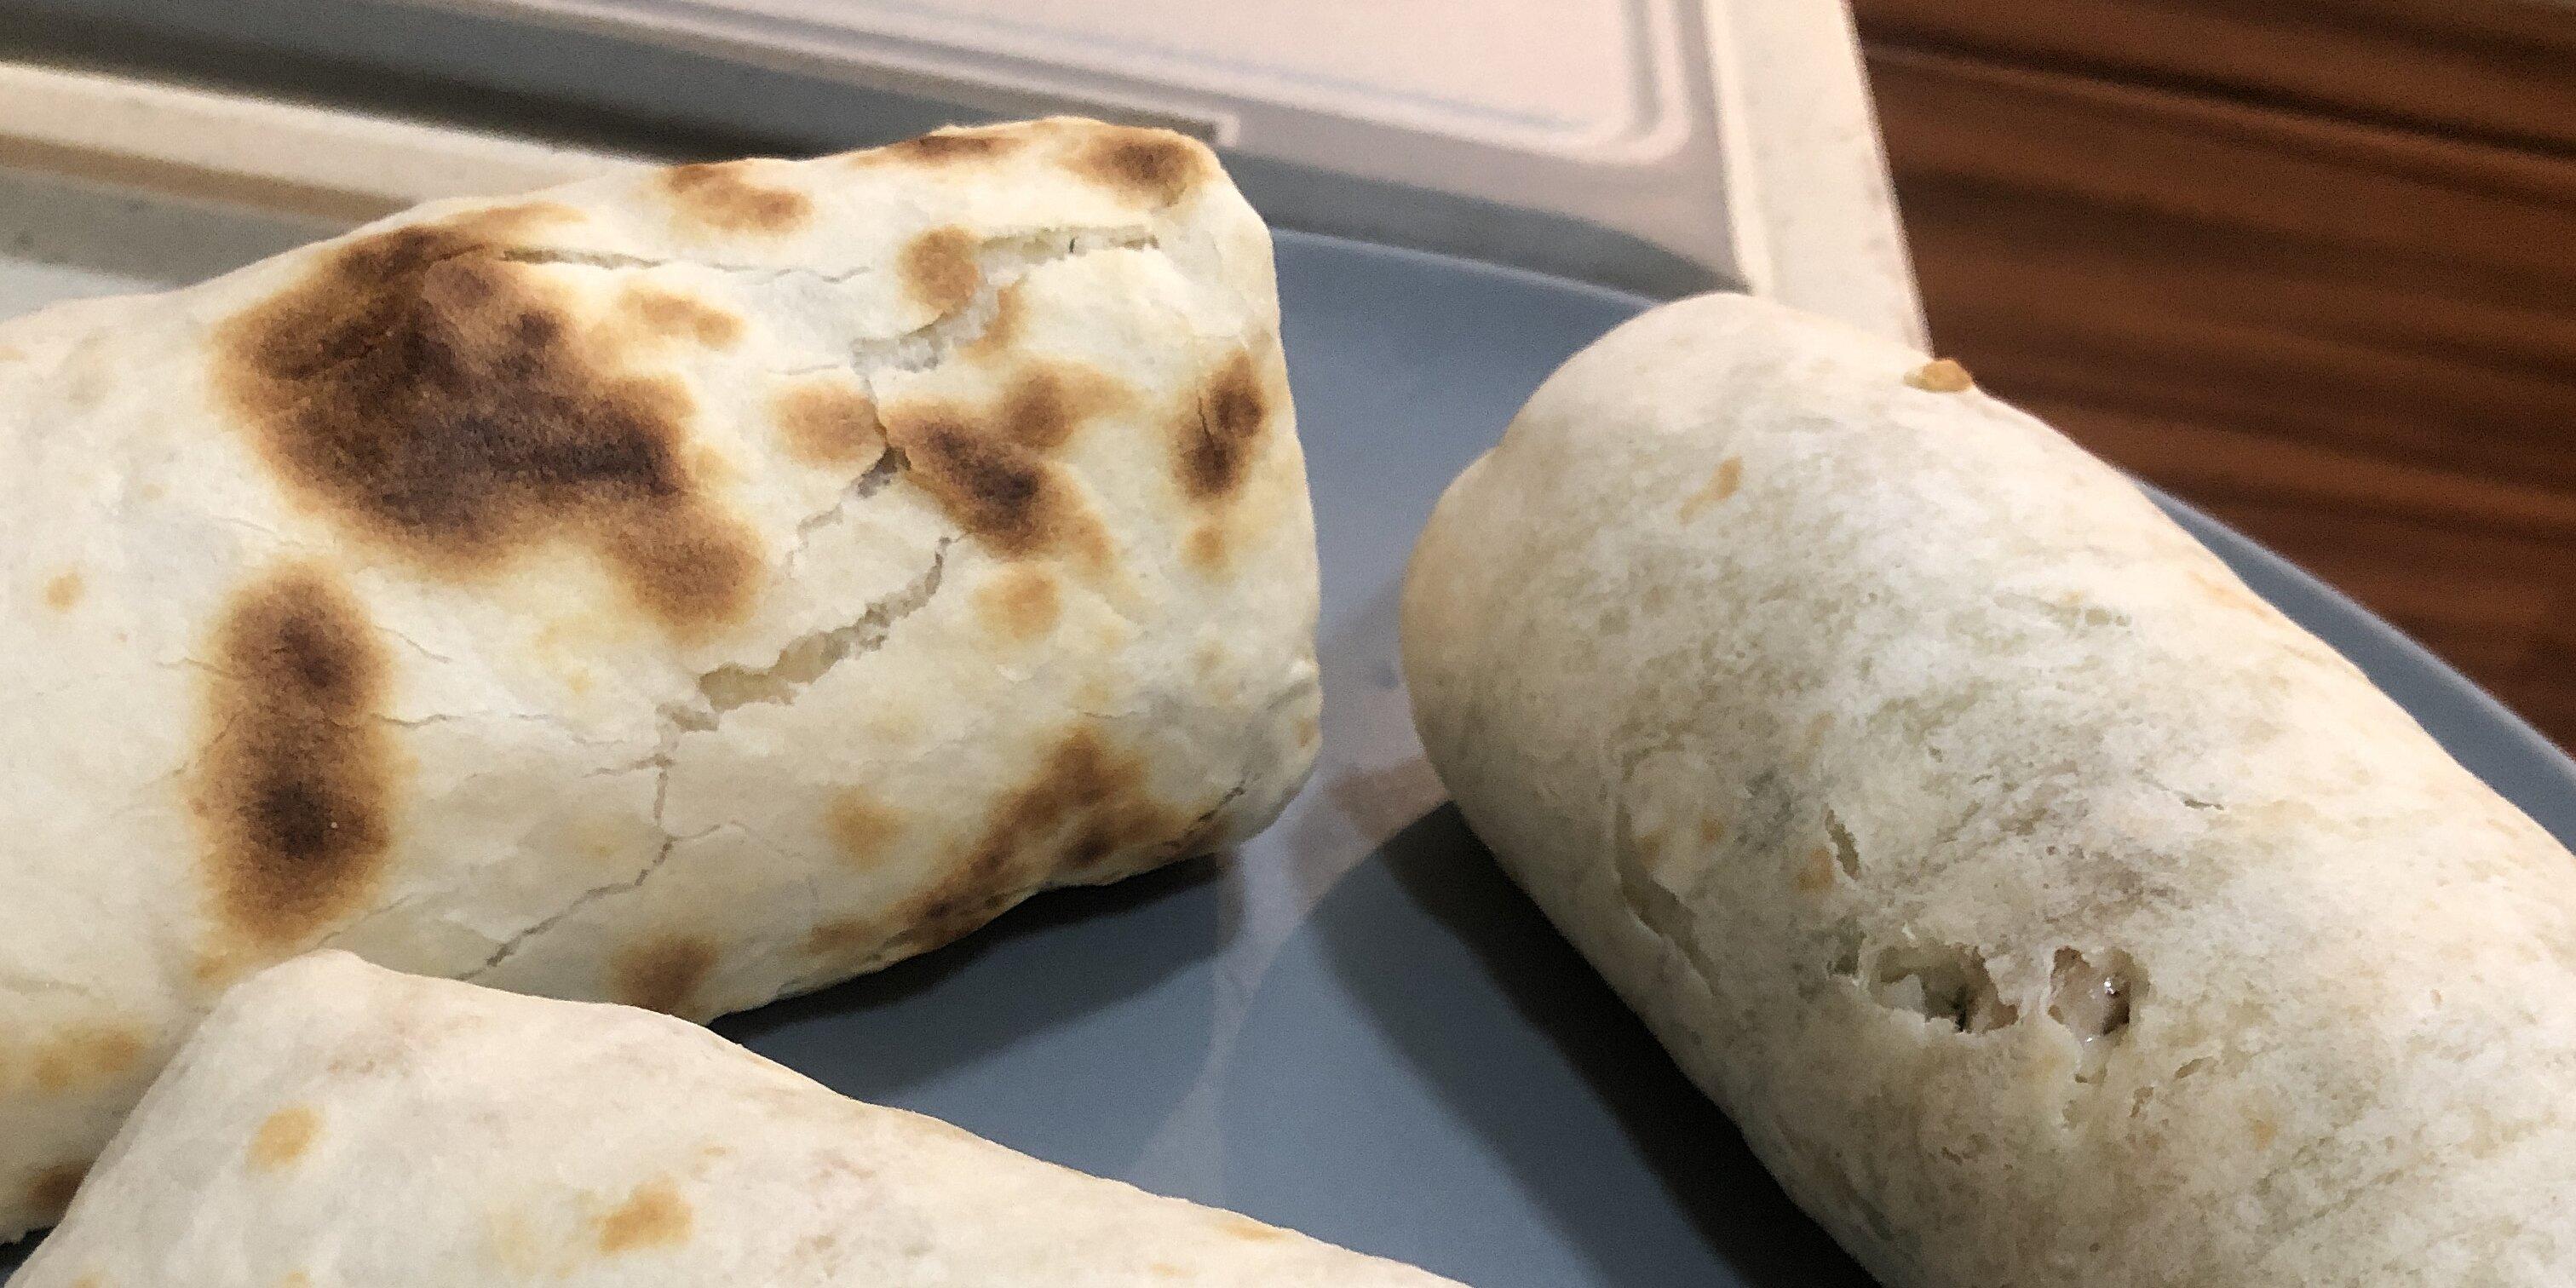 takeout burritos recipe